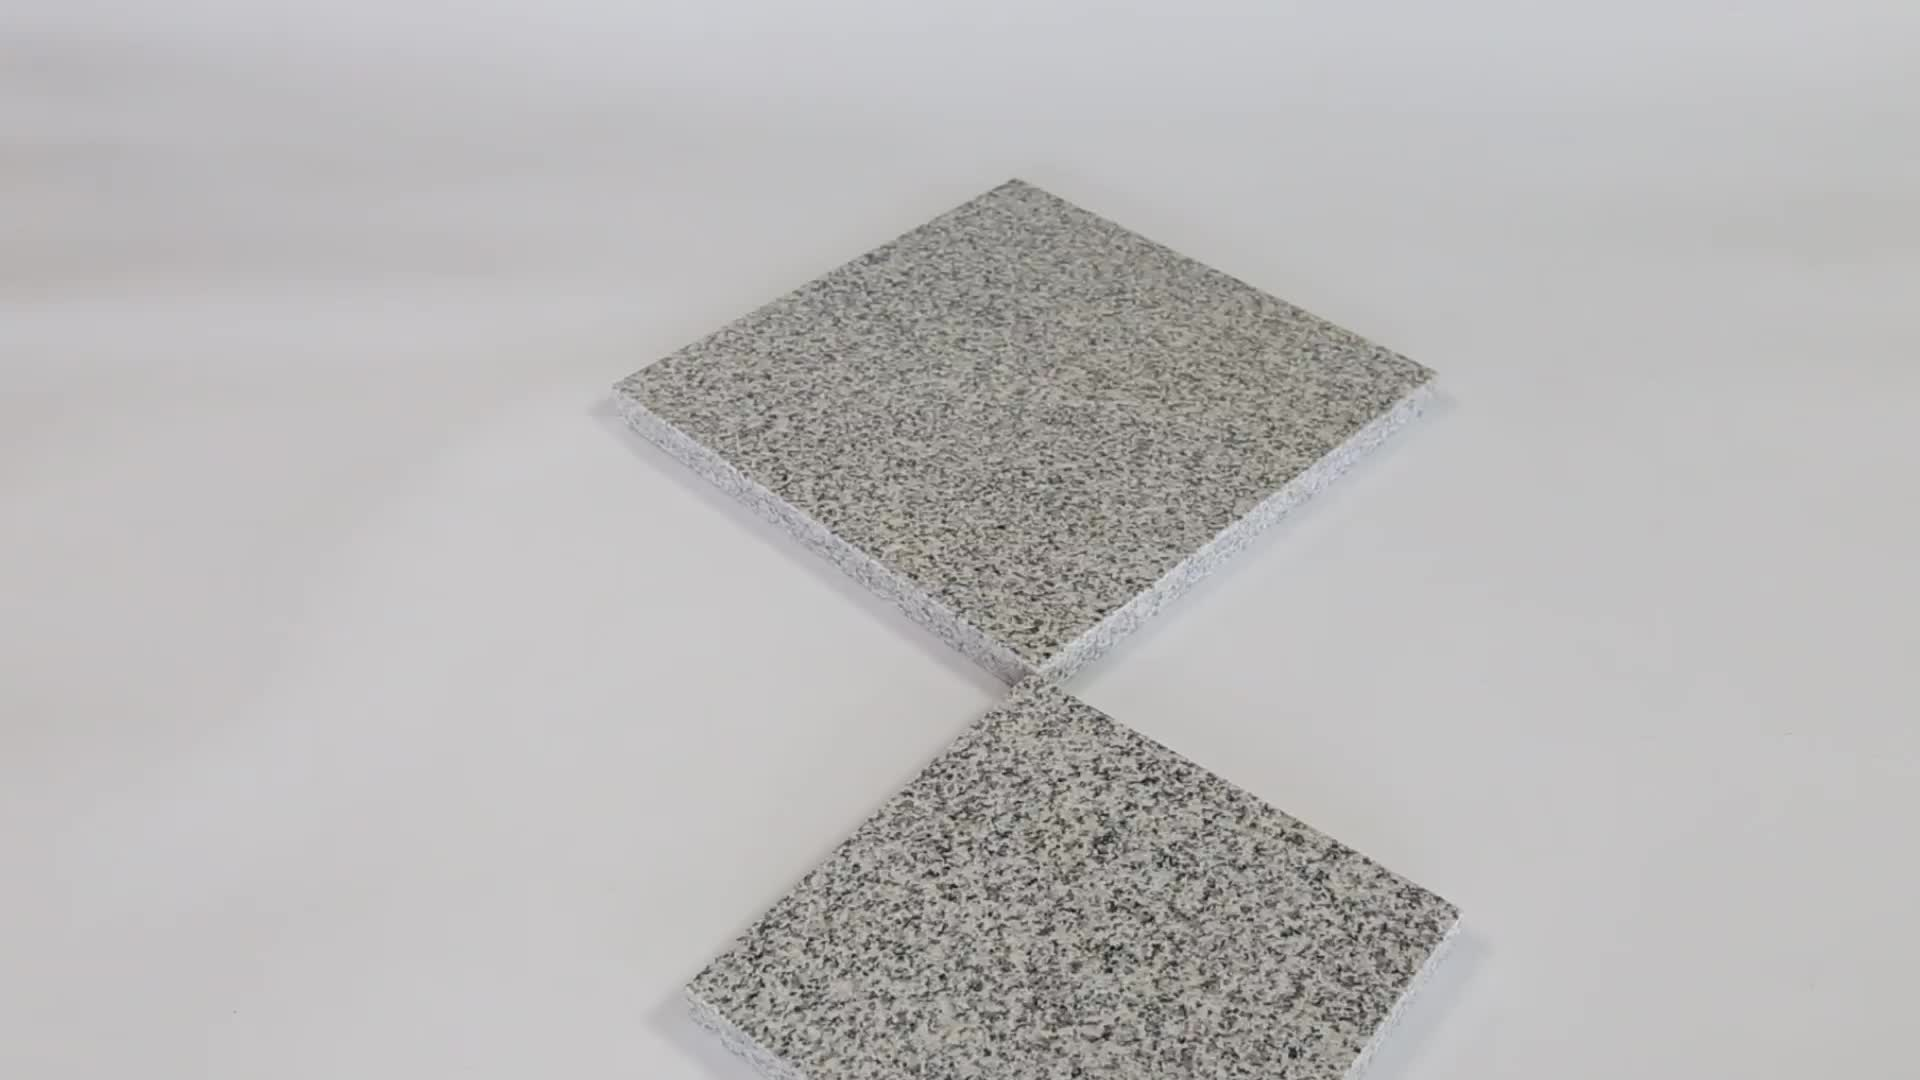 G603 Sesame Large Slab Chinese White Granite